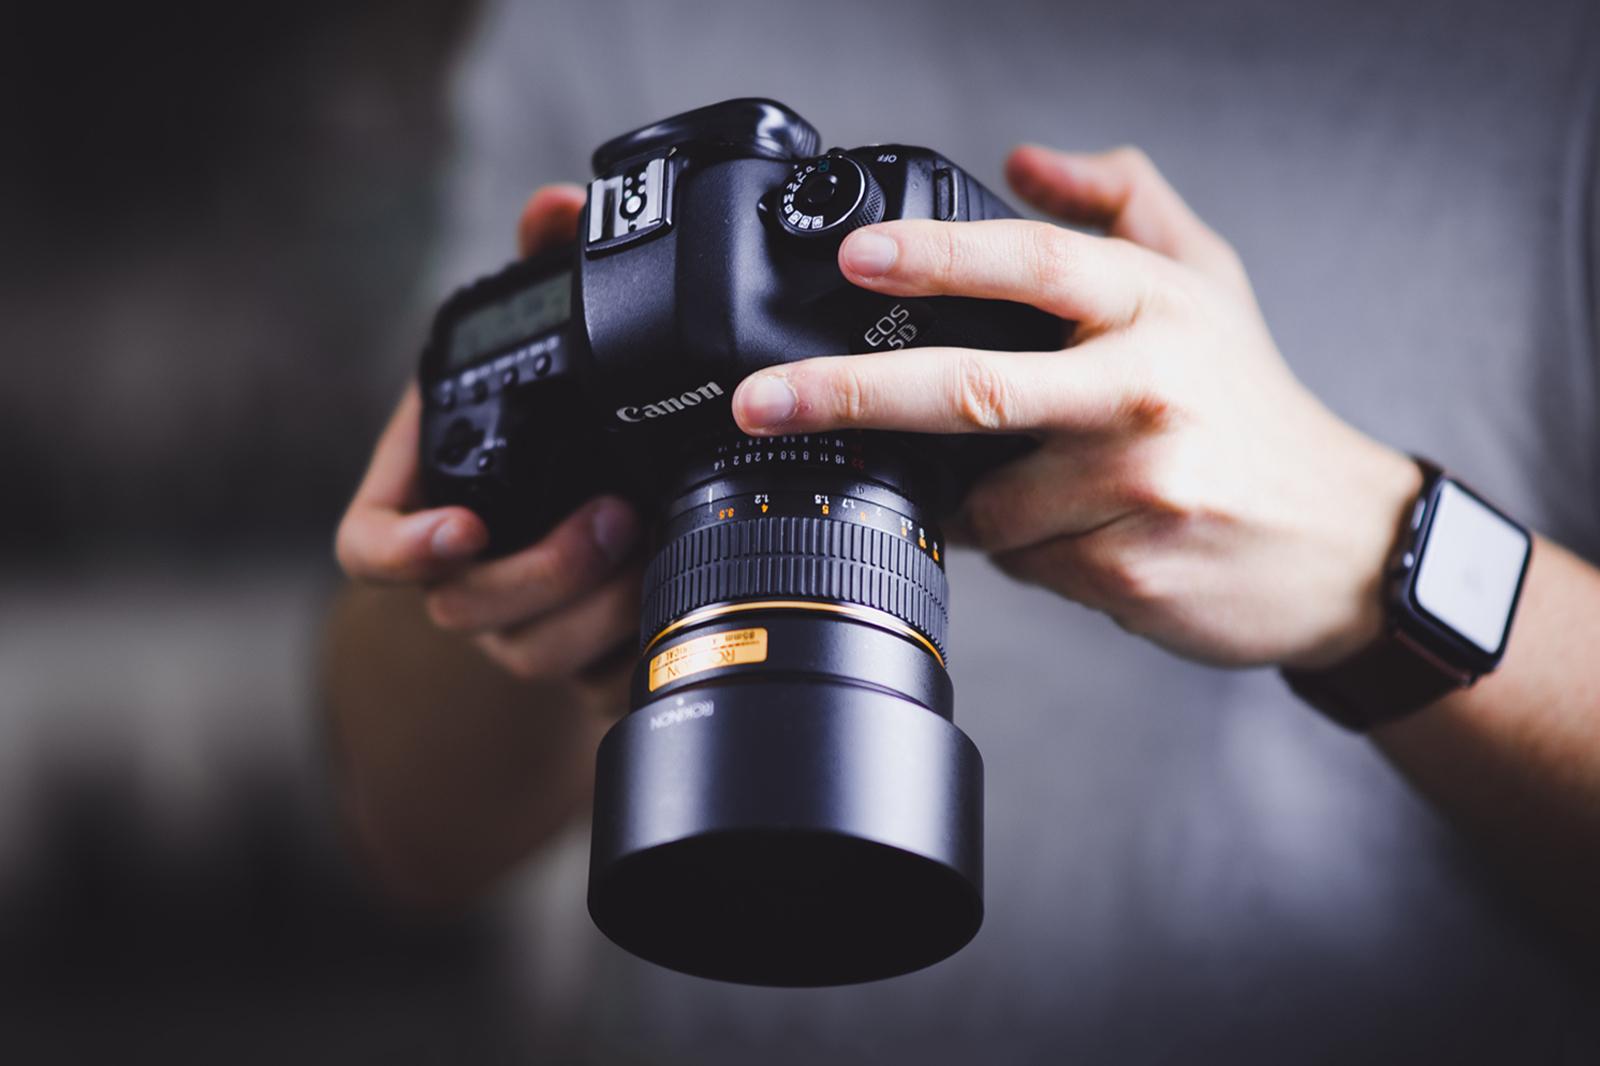 Learn Photography - Digital Photography Course - FutureLearn